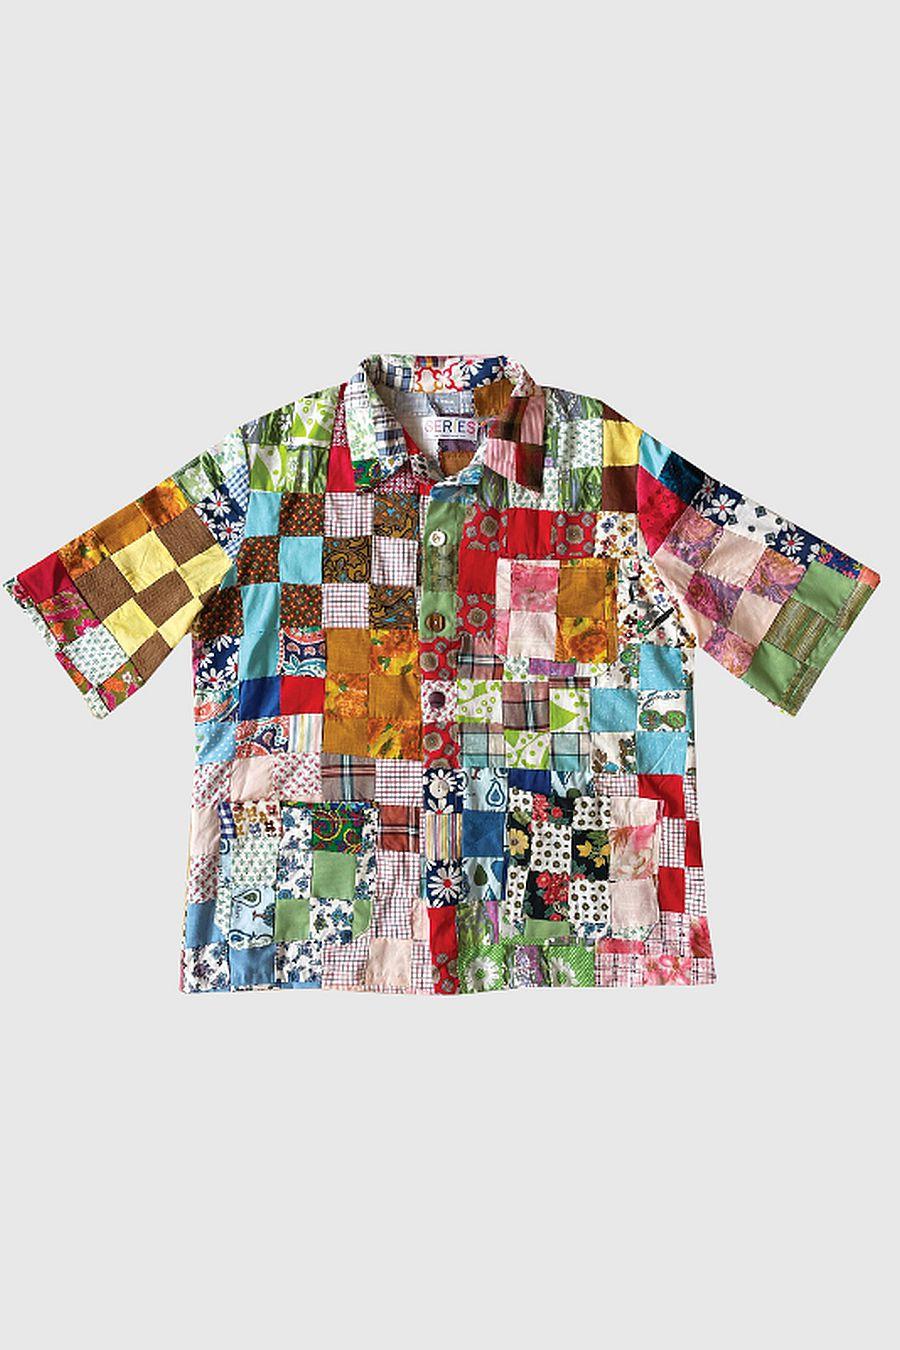 The Series NY Chore Shirt - QSCH008